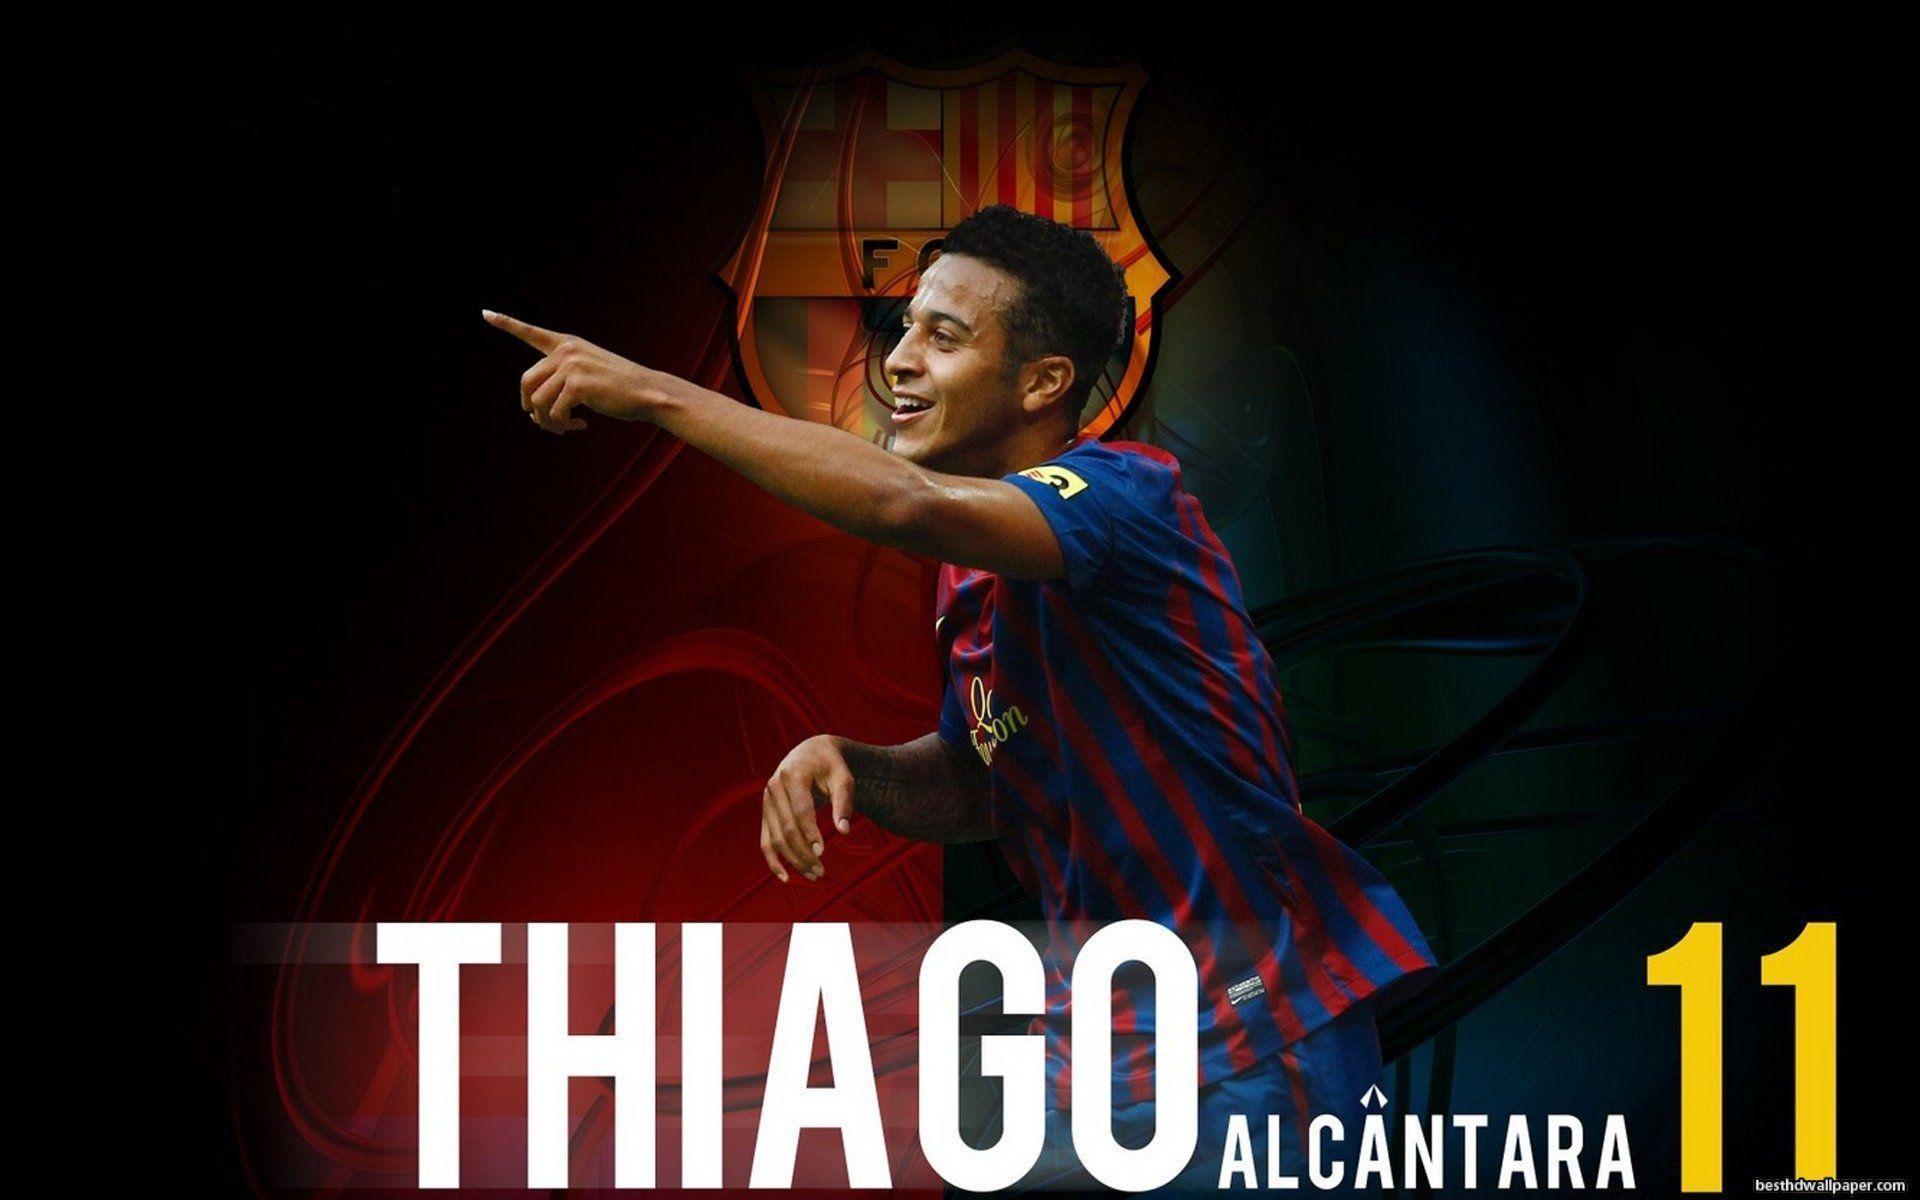 Thiago Alcantara Wallpapers (44+)